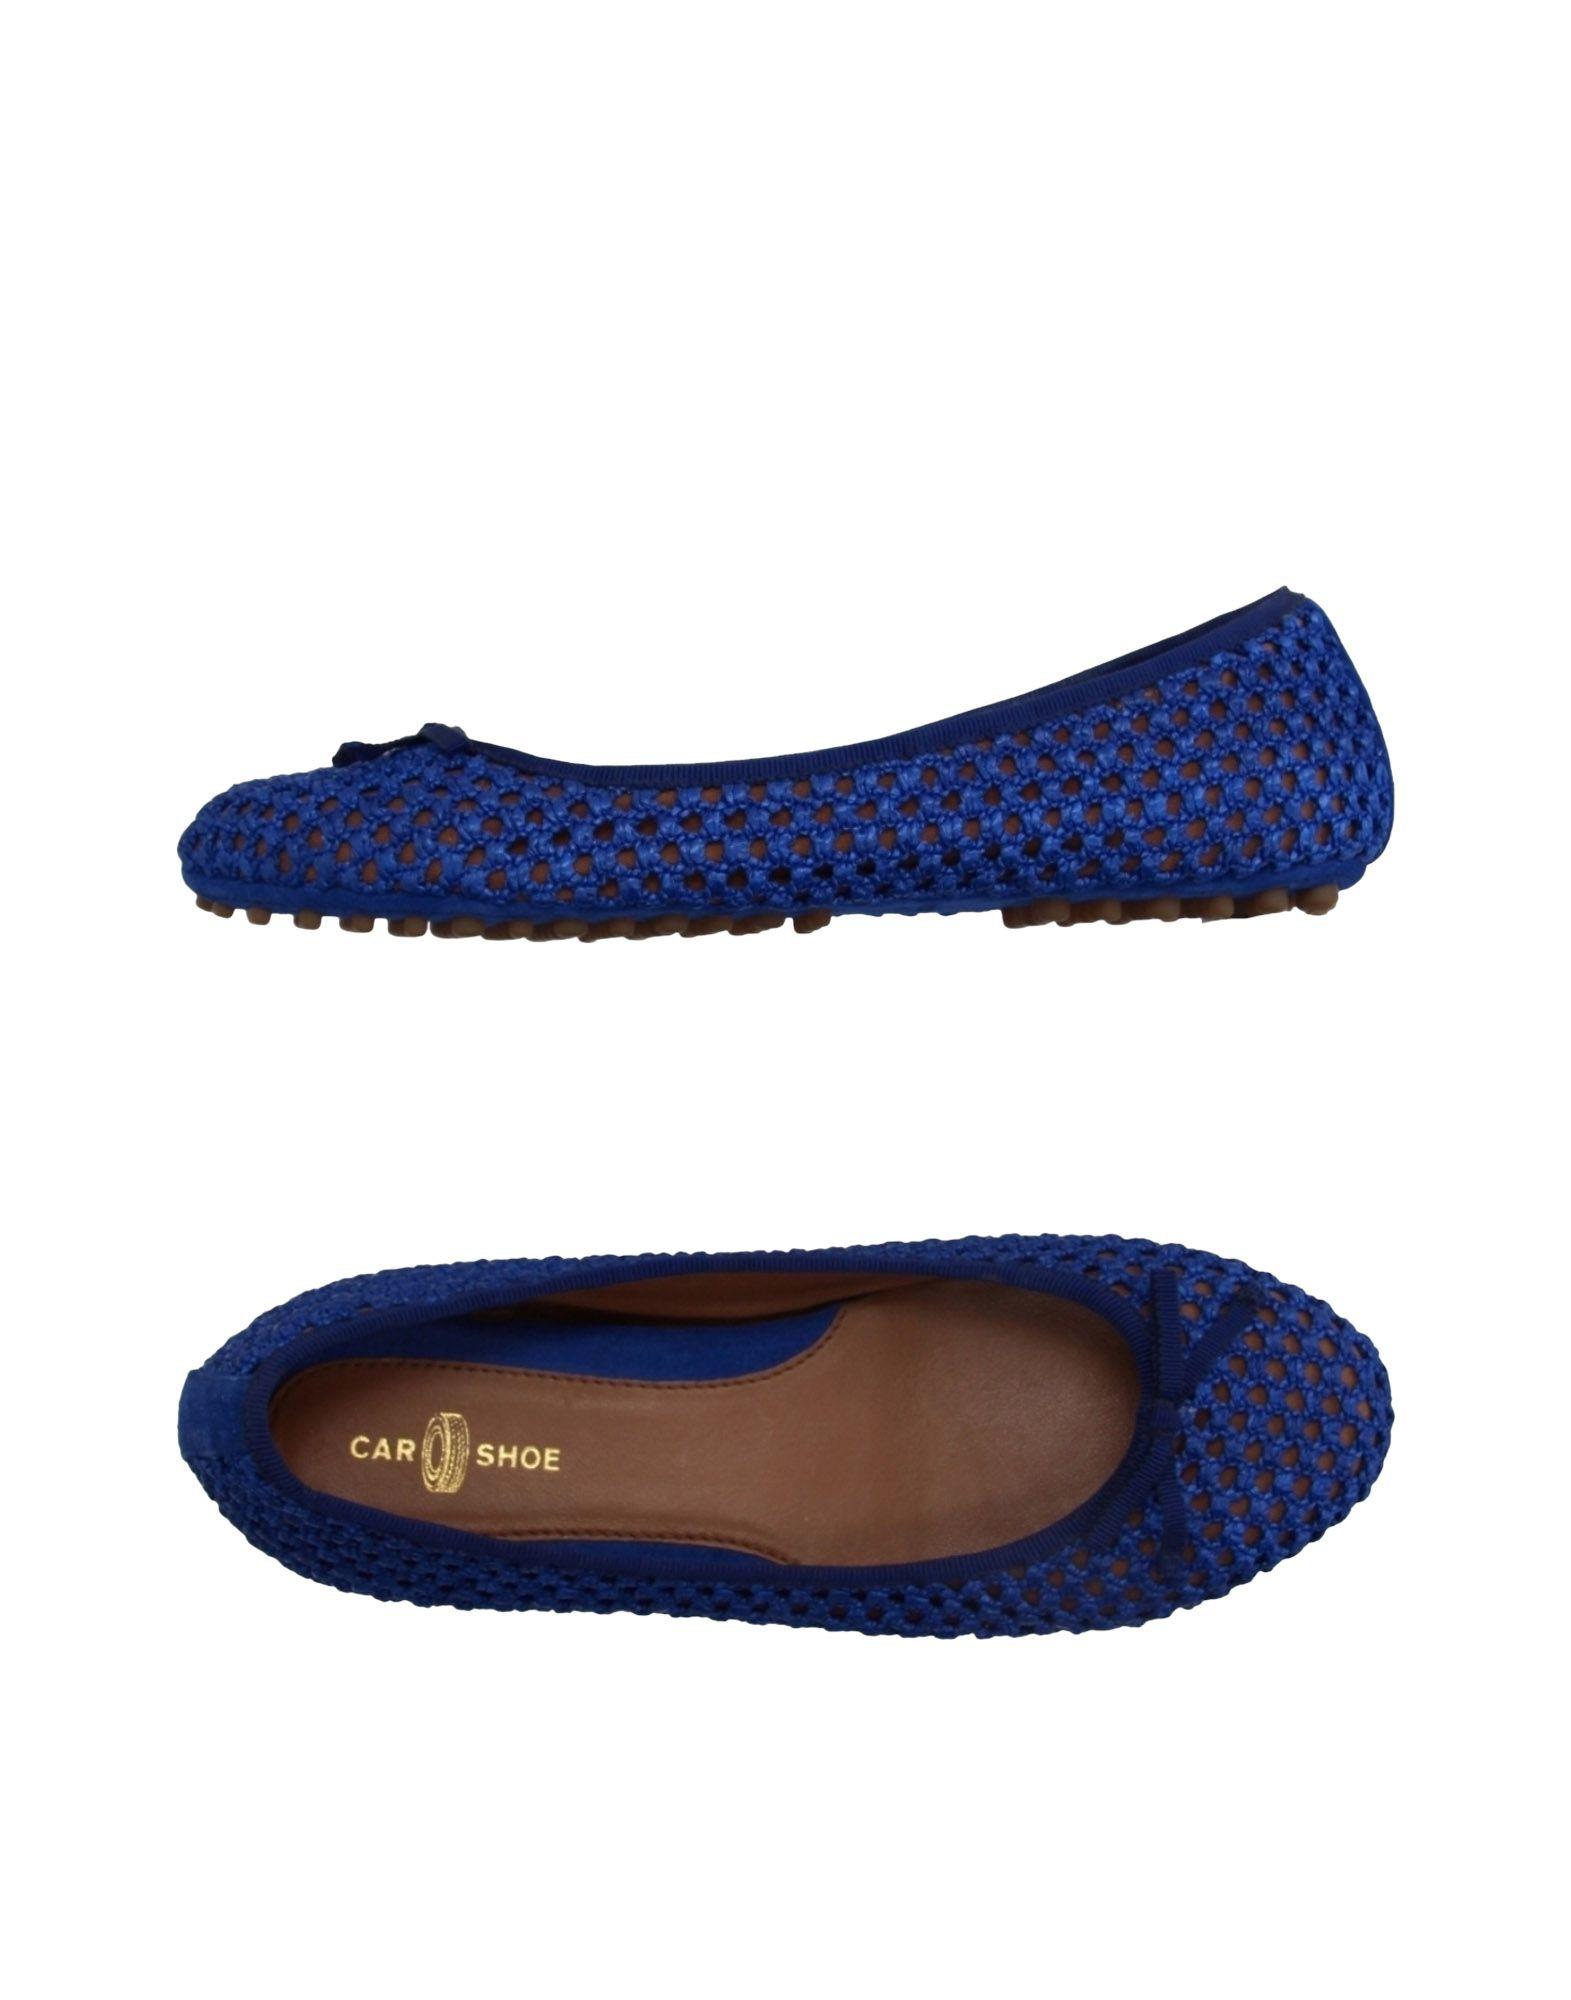 Car Shoe Ballet Flats In Blue (Bright Blue) | Lyst